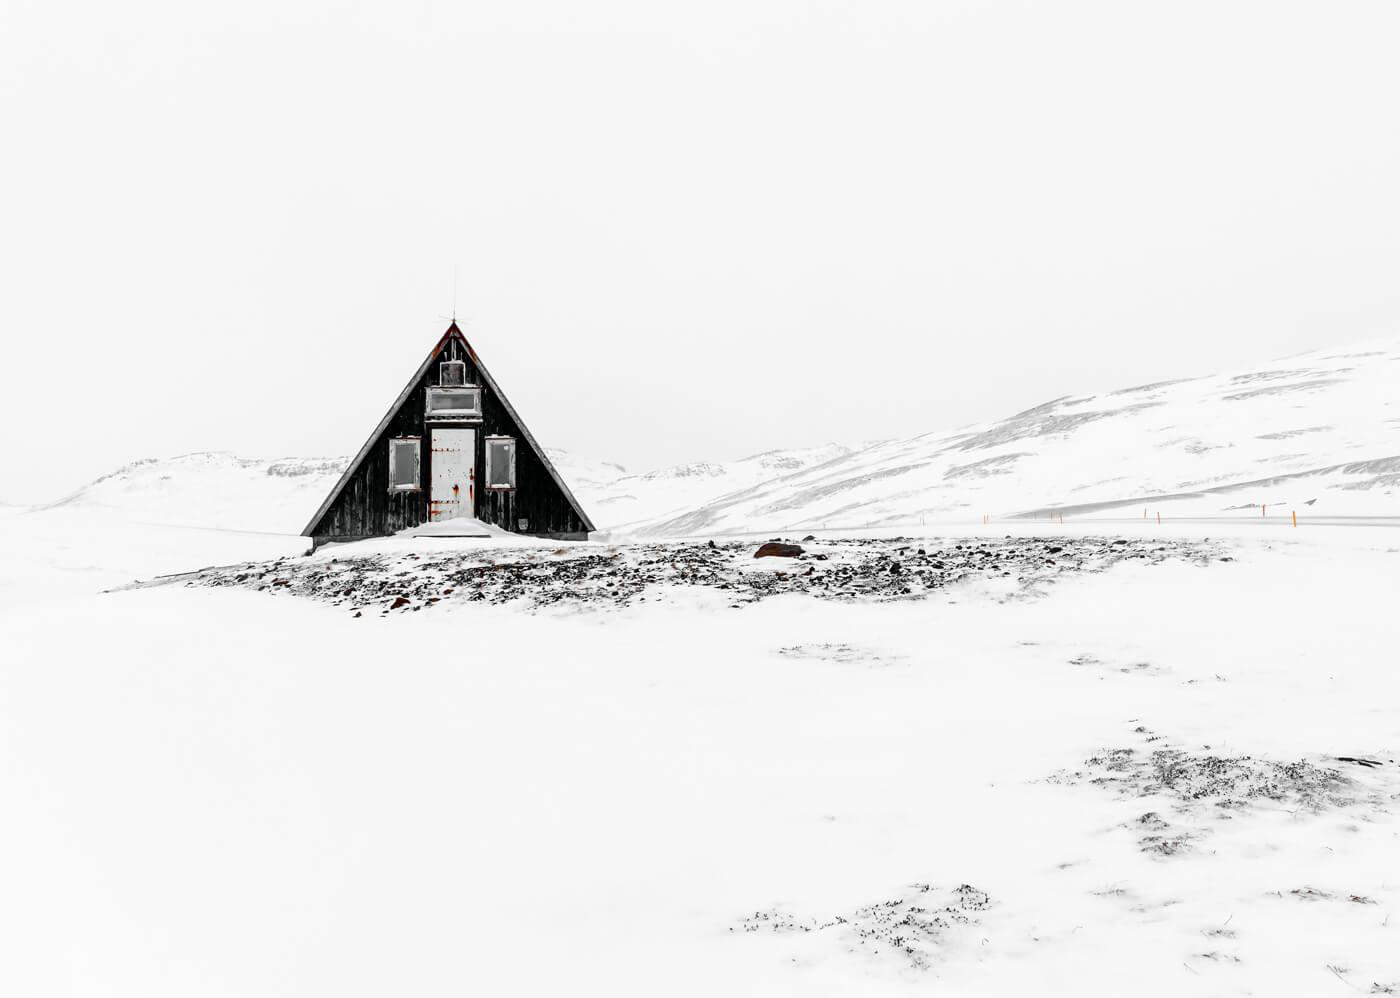 Emergency Hut, Iceland